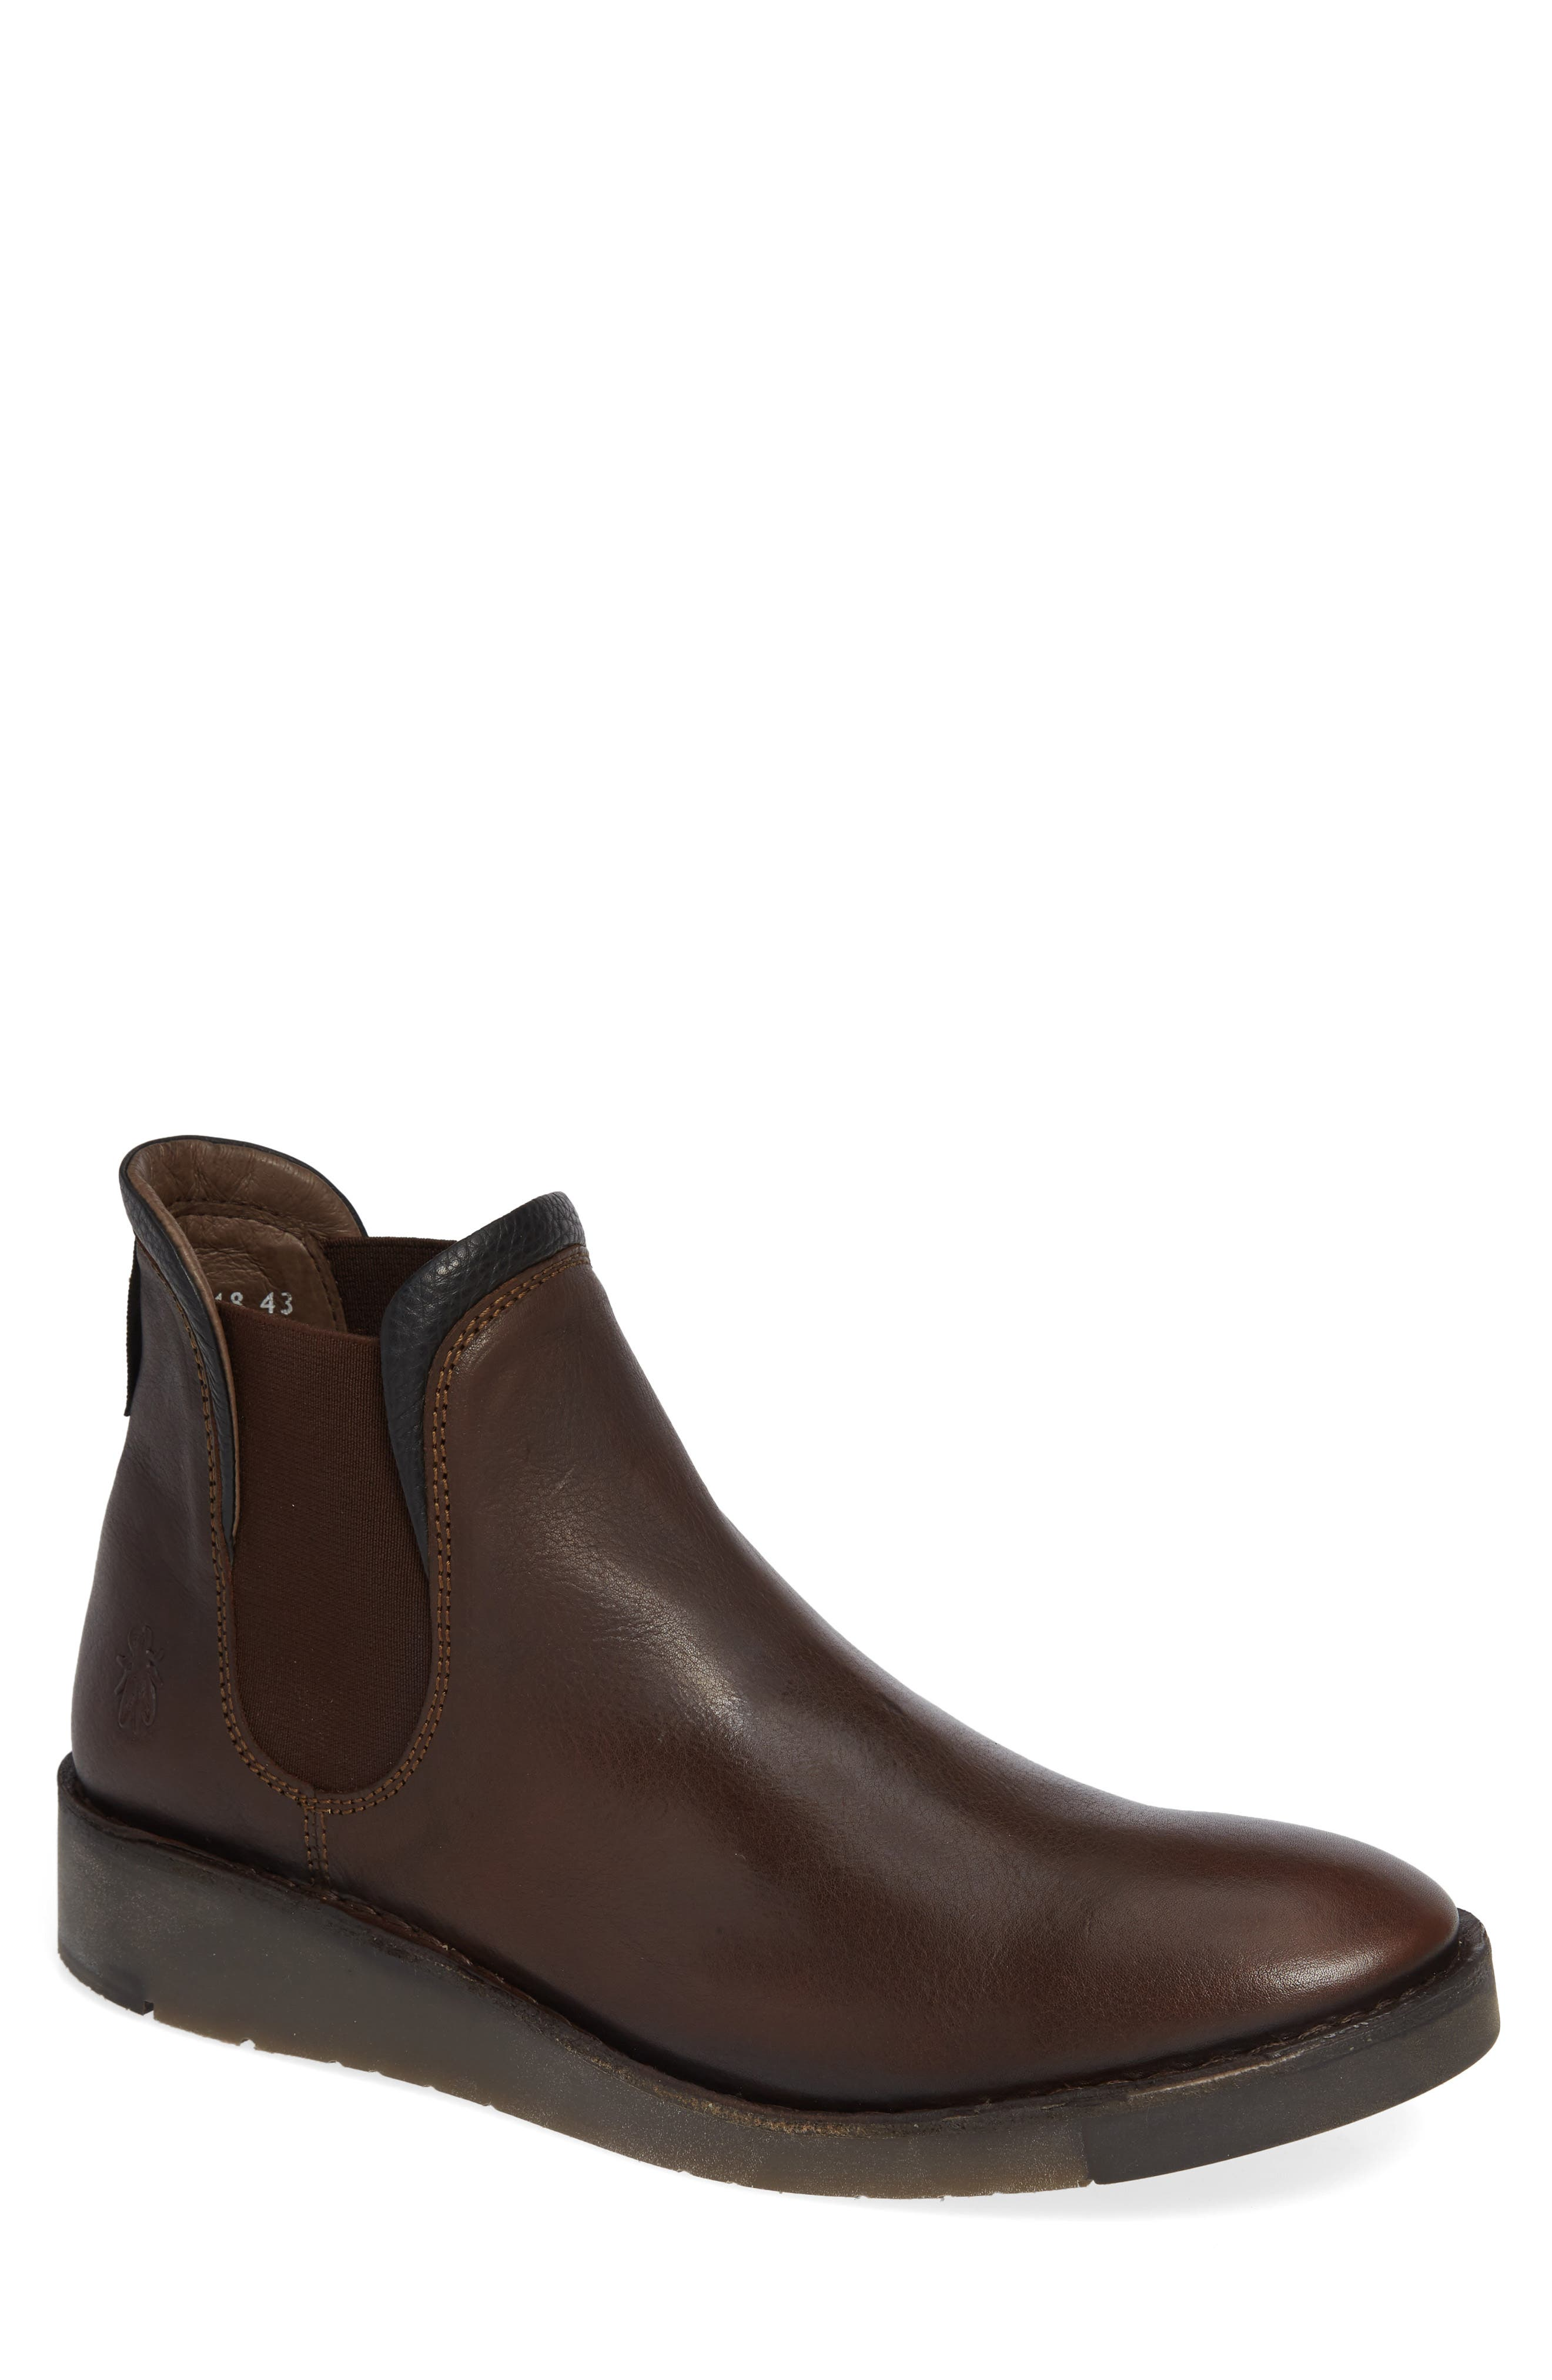 Sern Water Resistant Chelsea Boot,                             Main thumbnail 1, color,                             Brown Apso